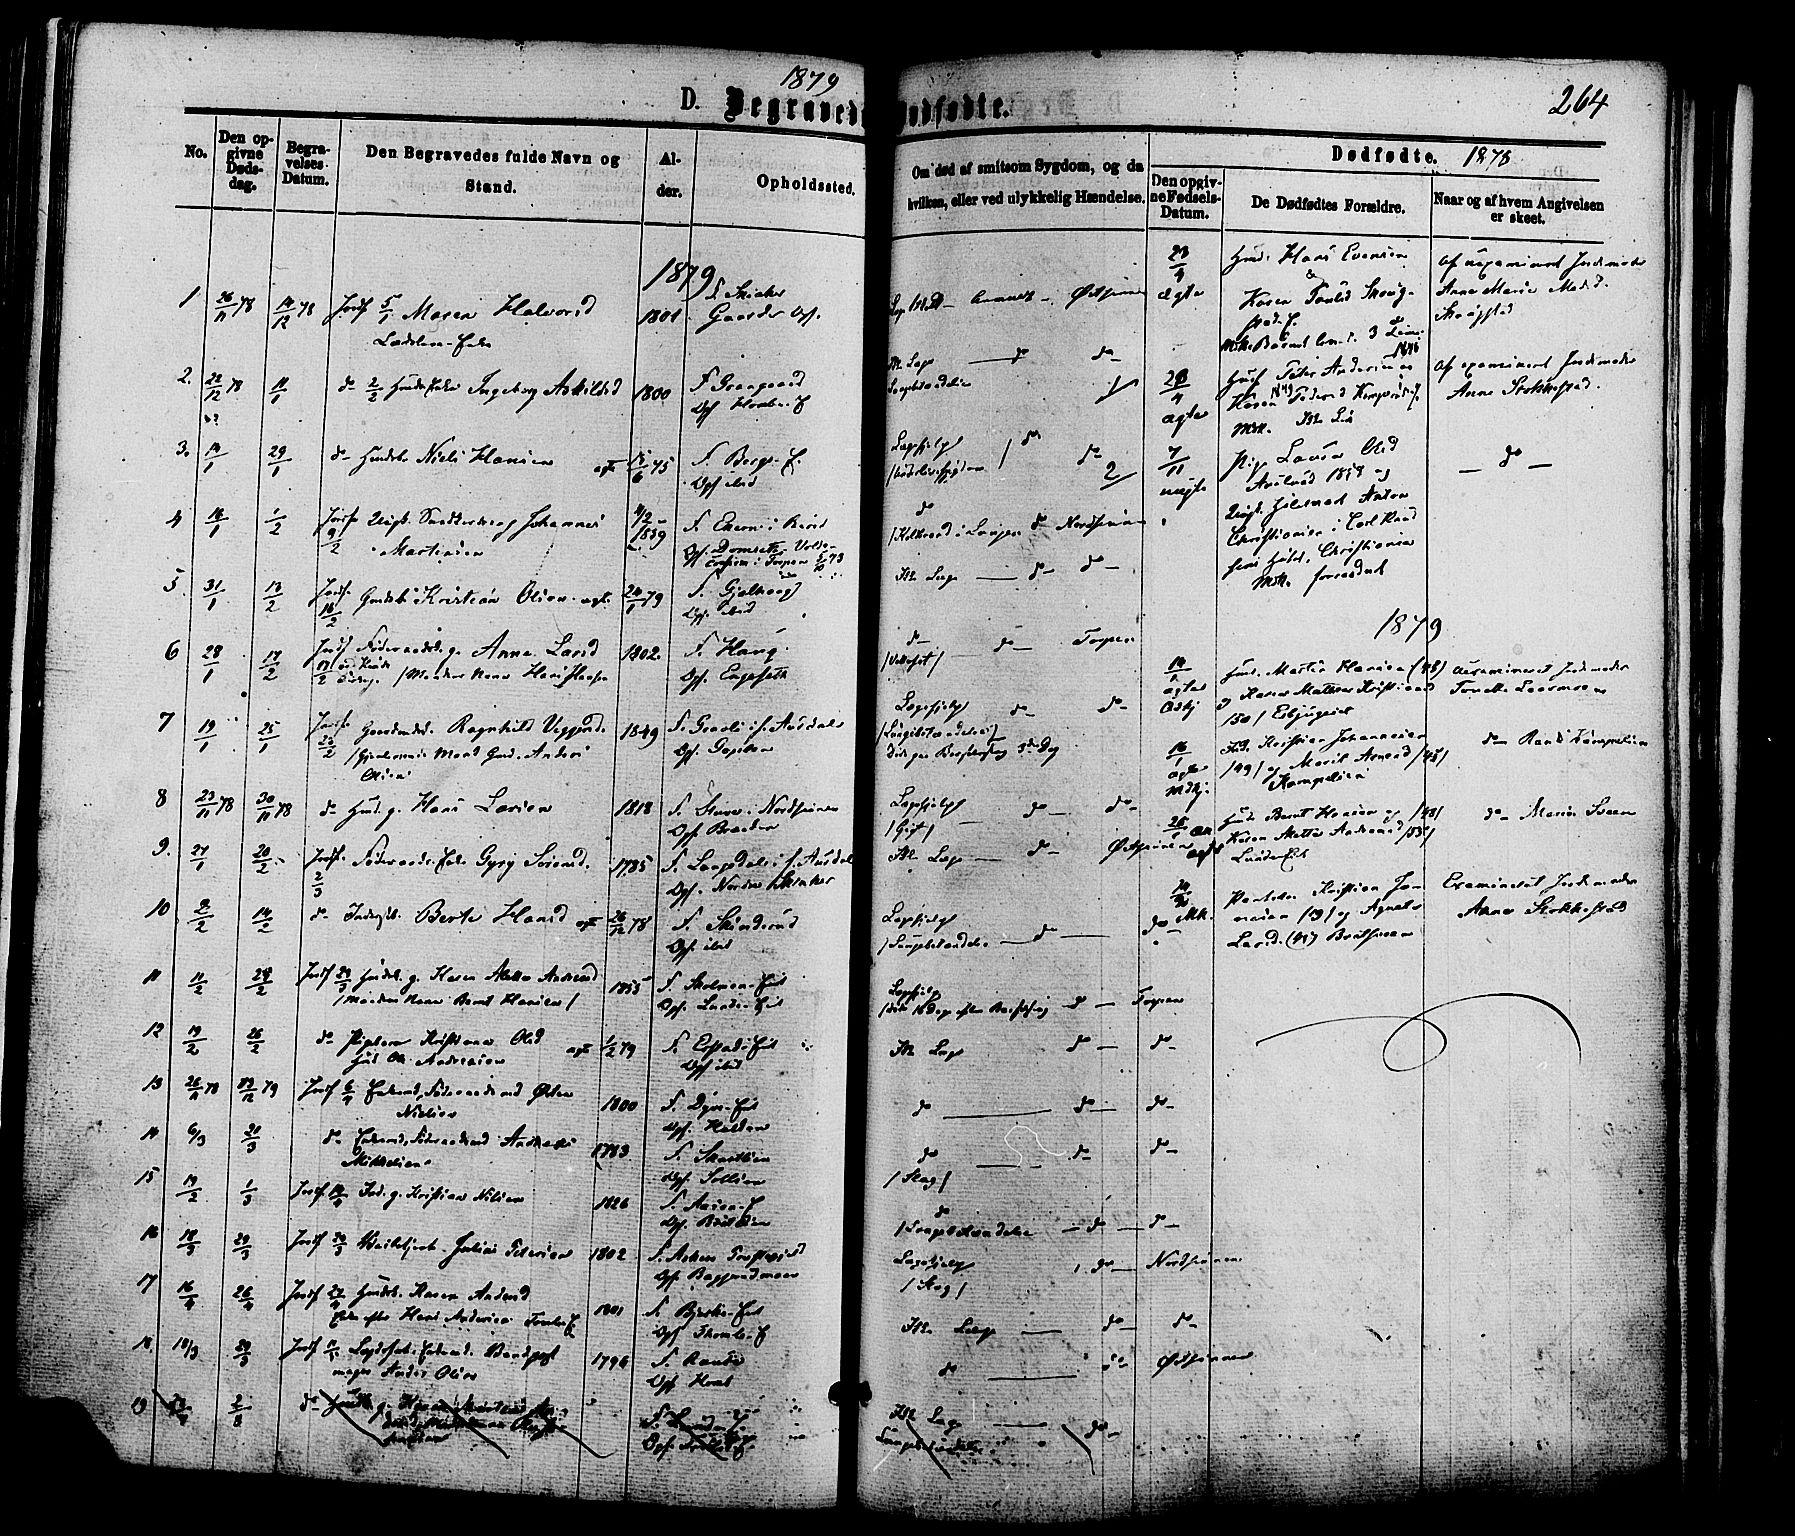 SAH, Nordre Land prestekontor, Ministerialbok nr. 2, 1872-1881, s. 264